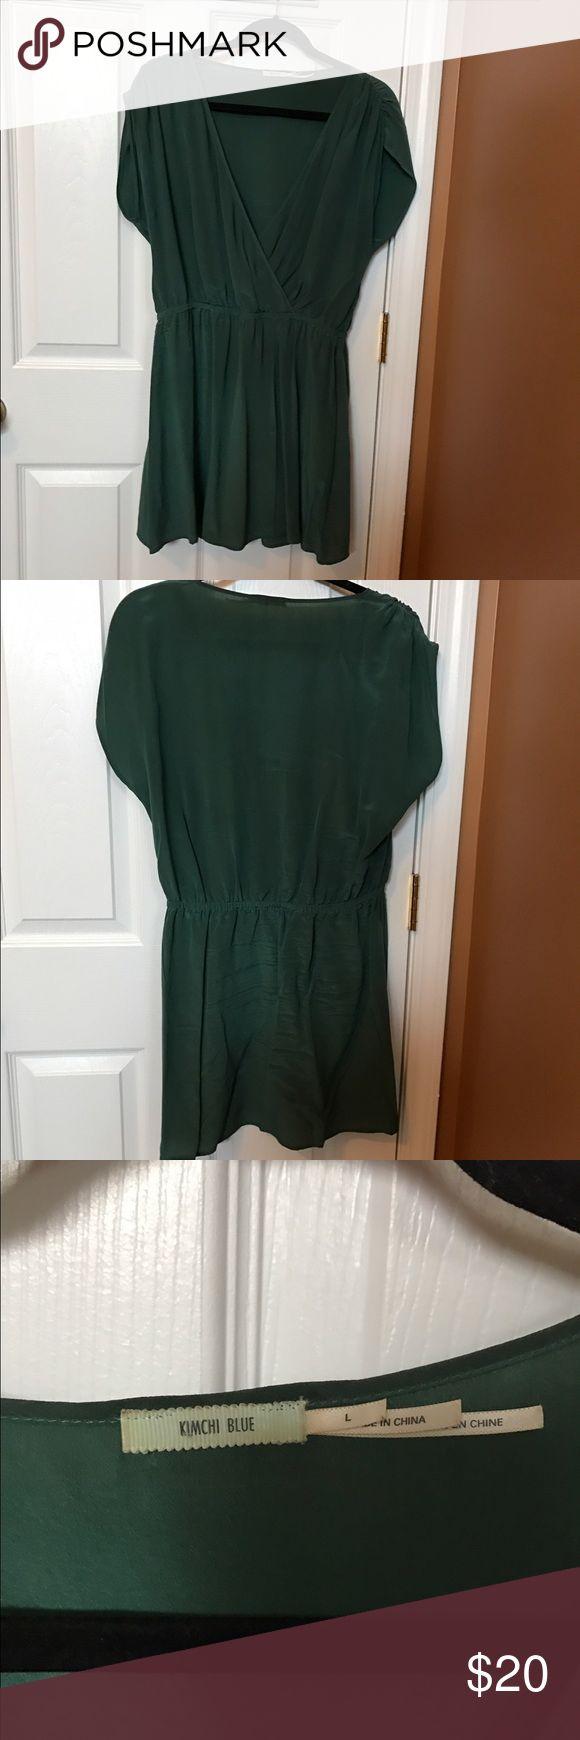 Kimchi Blue Shortsleeve Silk Surplice Dress Size L Very cute, casual dress. Gorgeous deep sea green color. 100% Silk. Kimchi Blue Dresses Midi